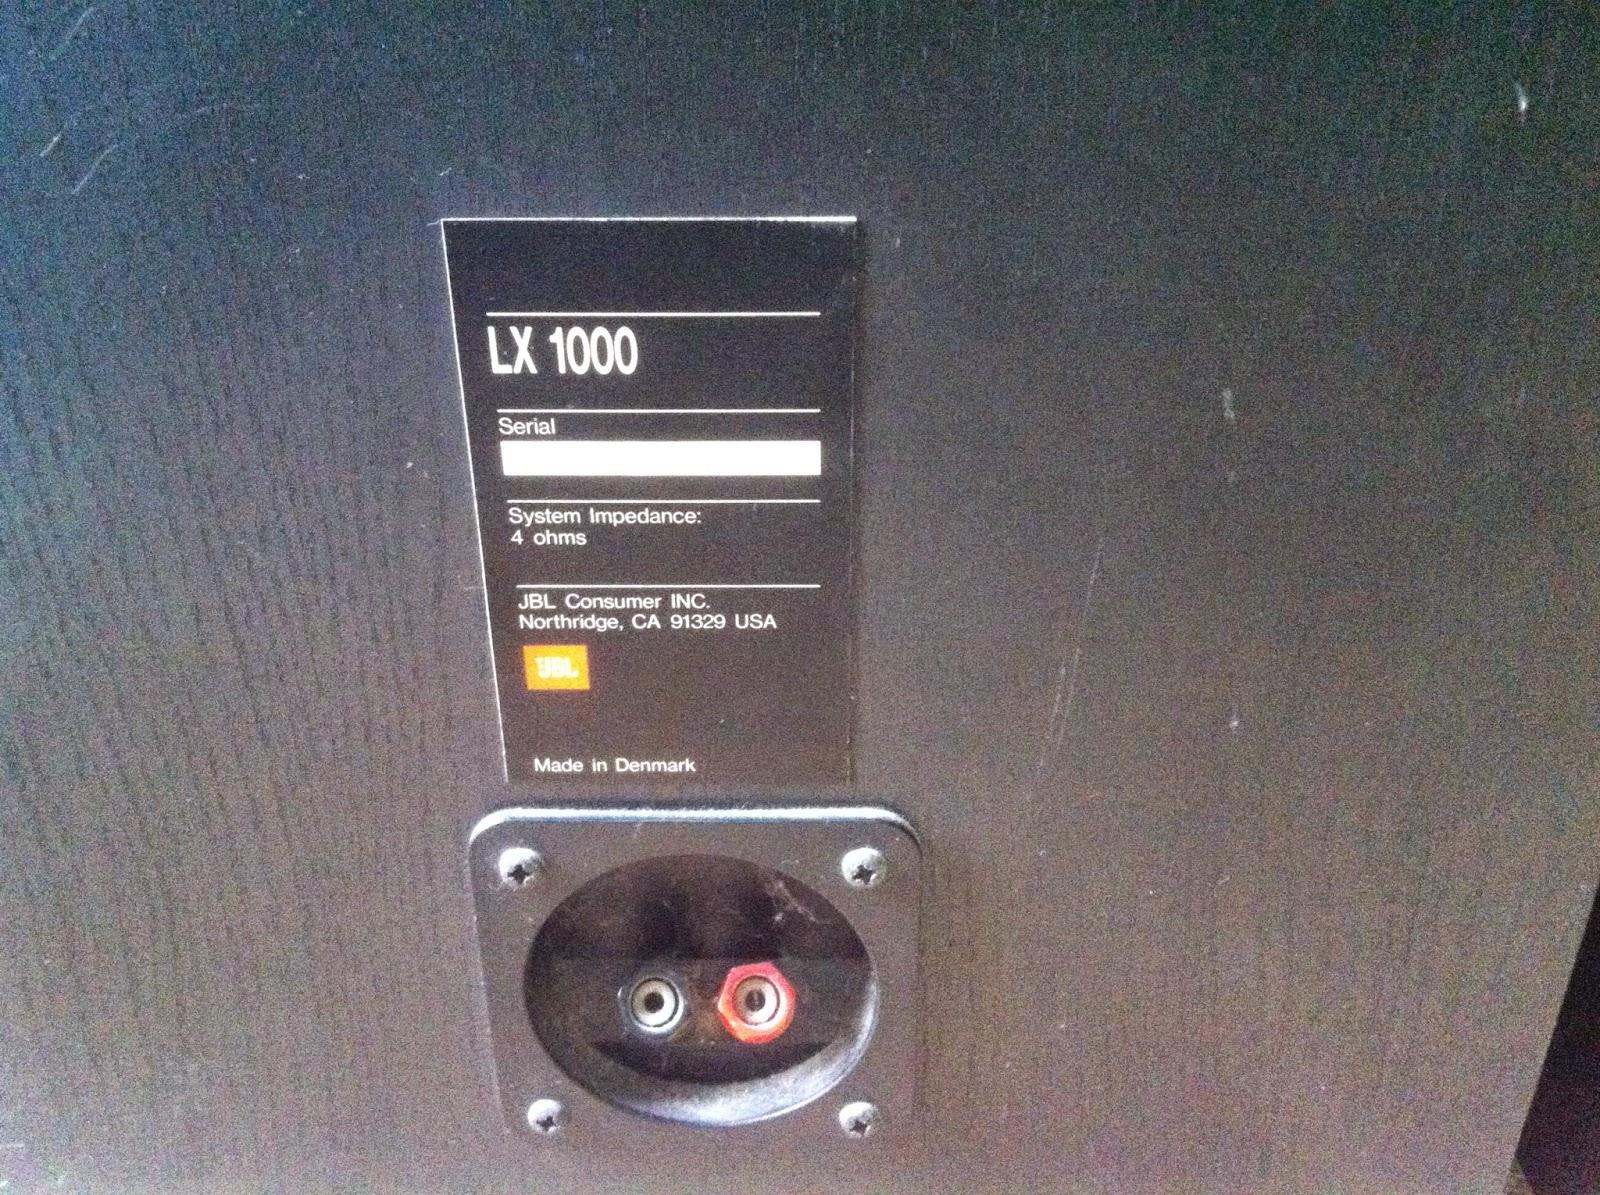 Cận cảnh cầu loa JBL LX 1000